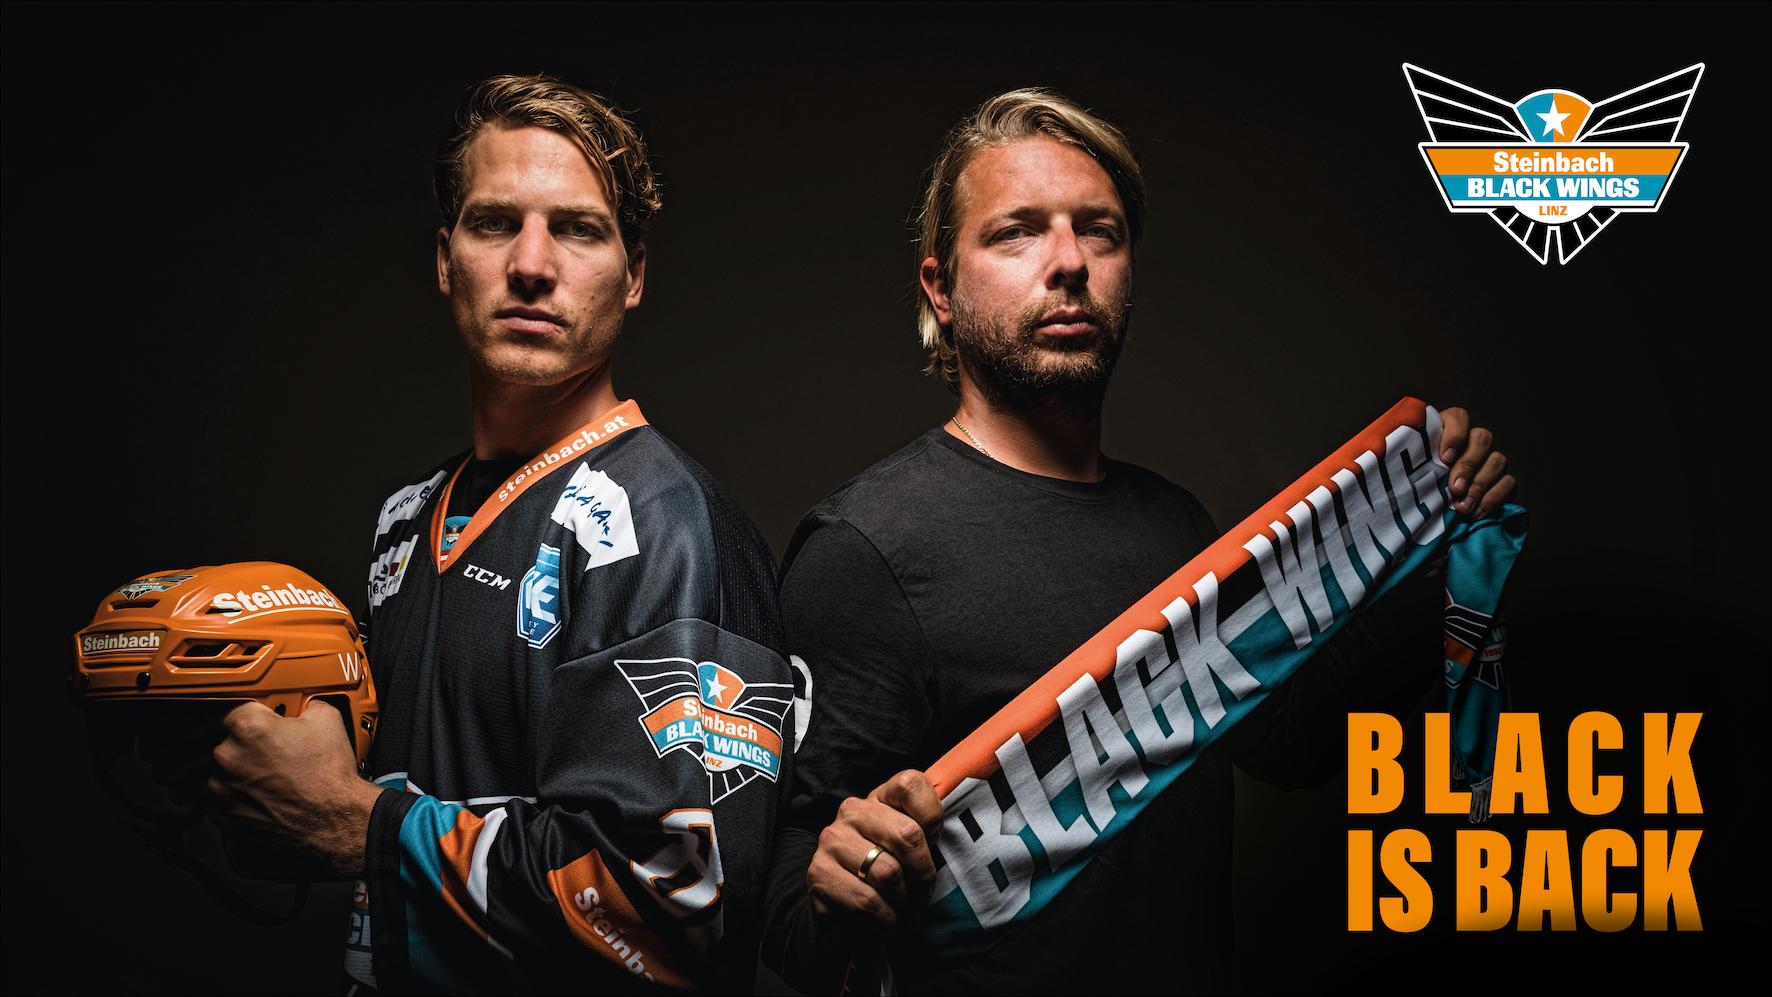 "v.l.n.r. Rafael Rotter (Steinbach Black Wings Linz), Brian Lebler (Steinbach Black Wings Linz), Chris Rumble (Steinbach Black Wings Linz) Spielerpräsentation ""Black is Back"" am 31.8."